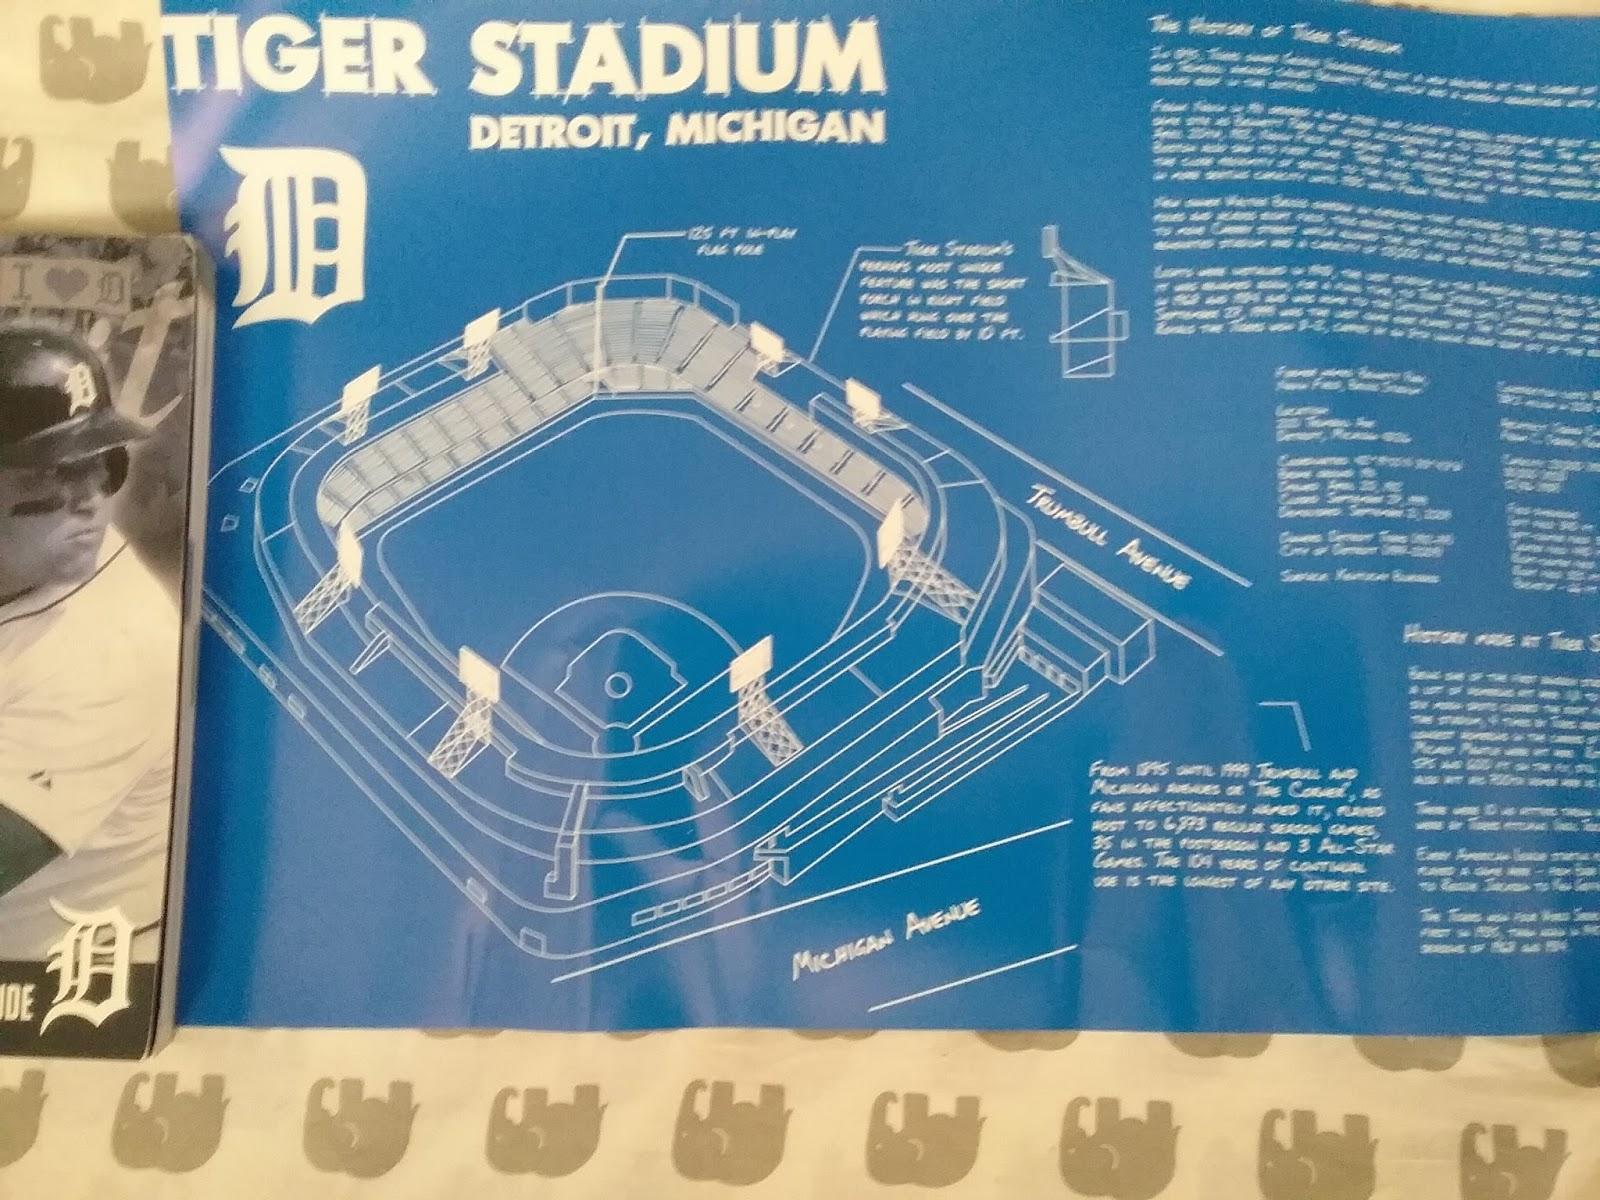 Johns big league baseball blog may 2016 malvernweather Gallery